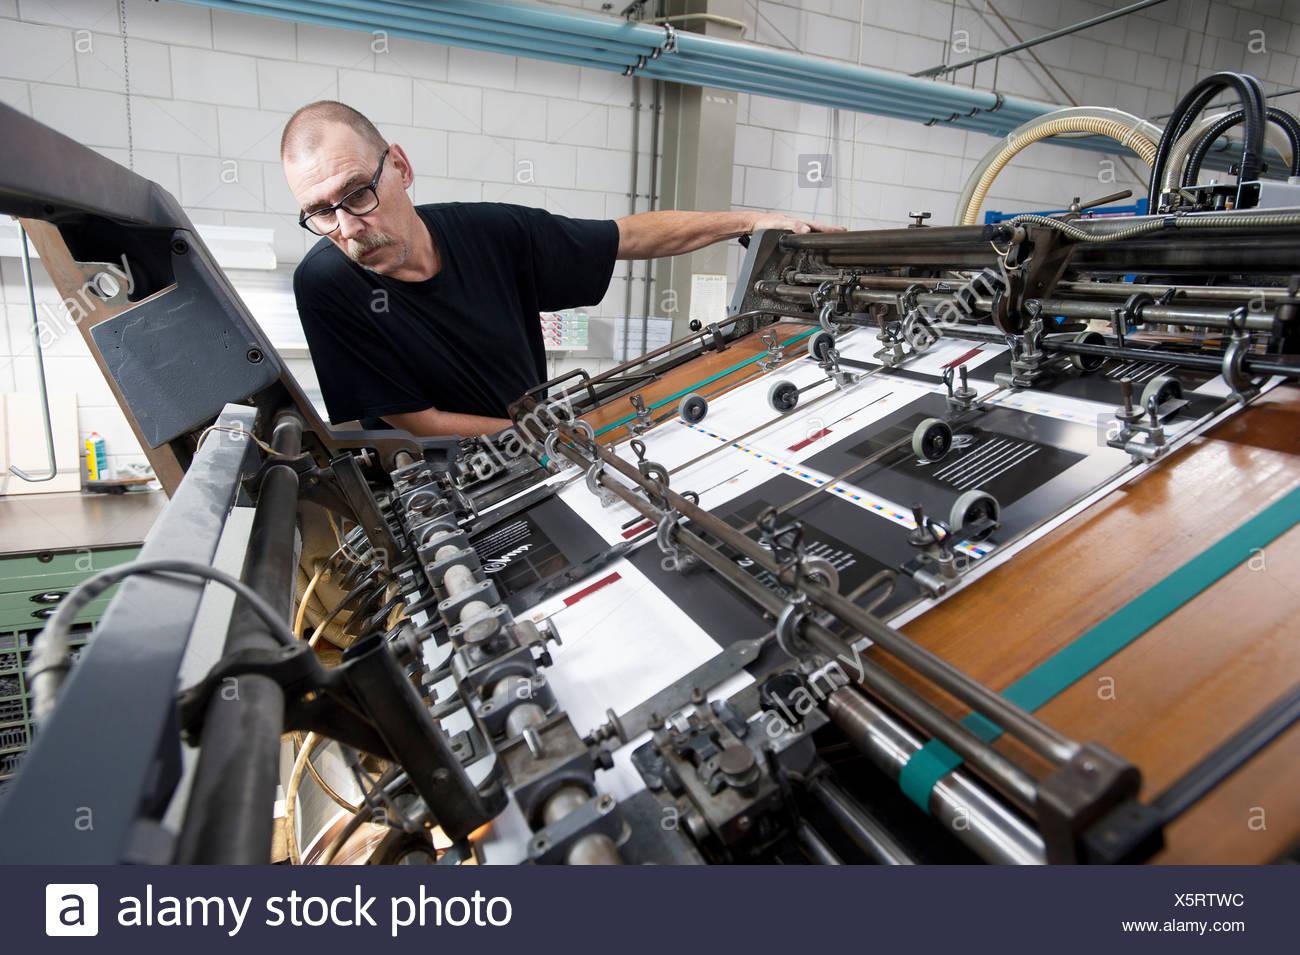 Worker monitoring print machine in printing workshop - Stock Image